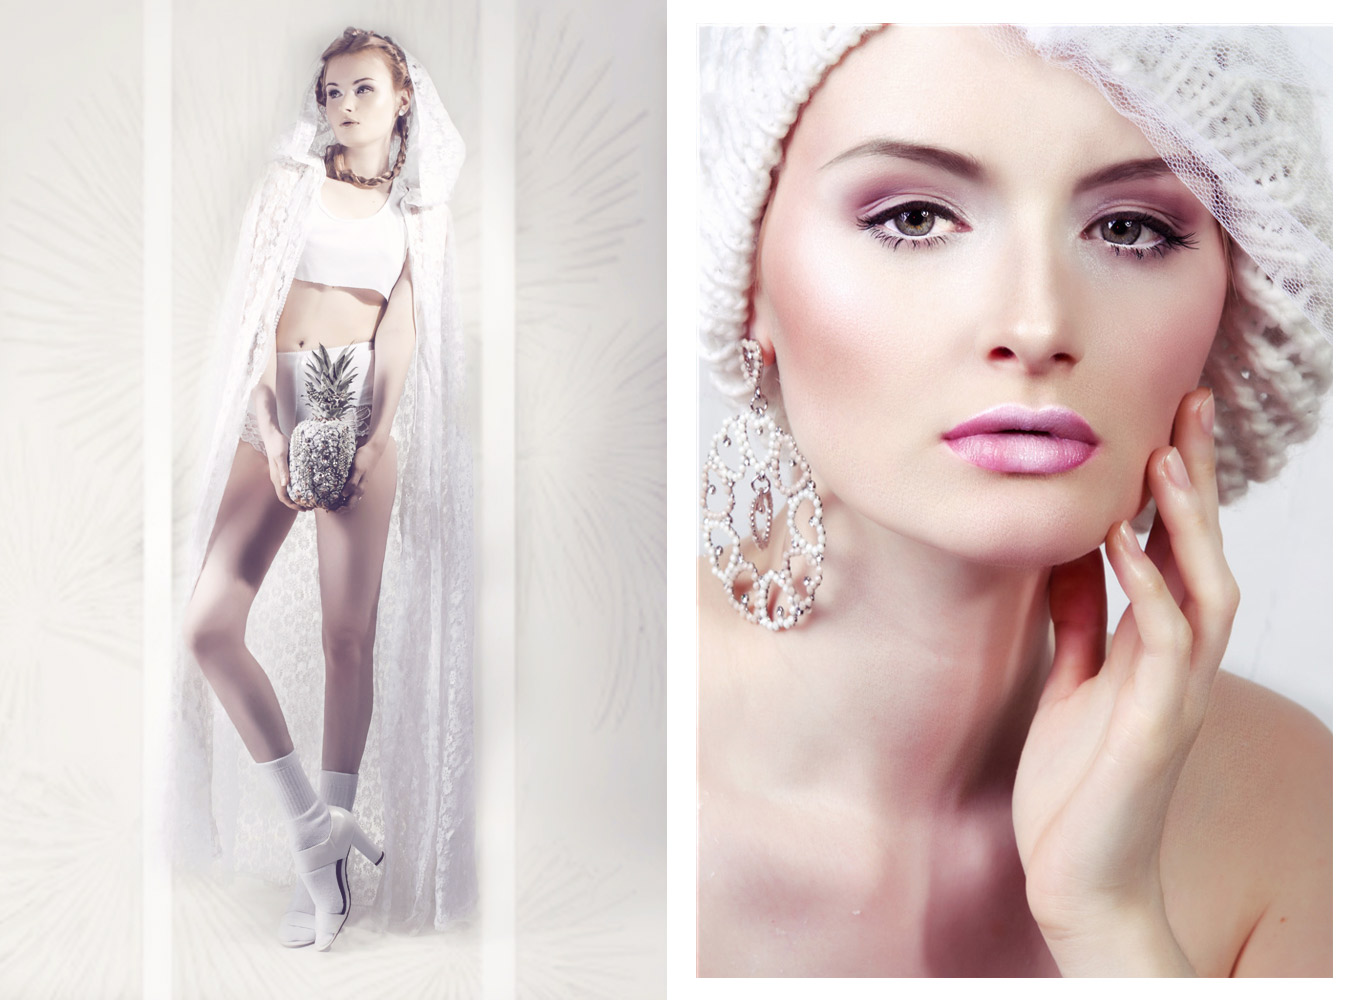 luvisa-pastell-make-up-05